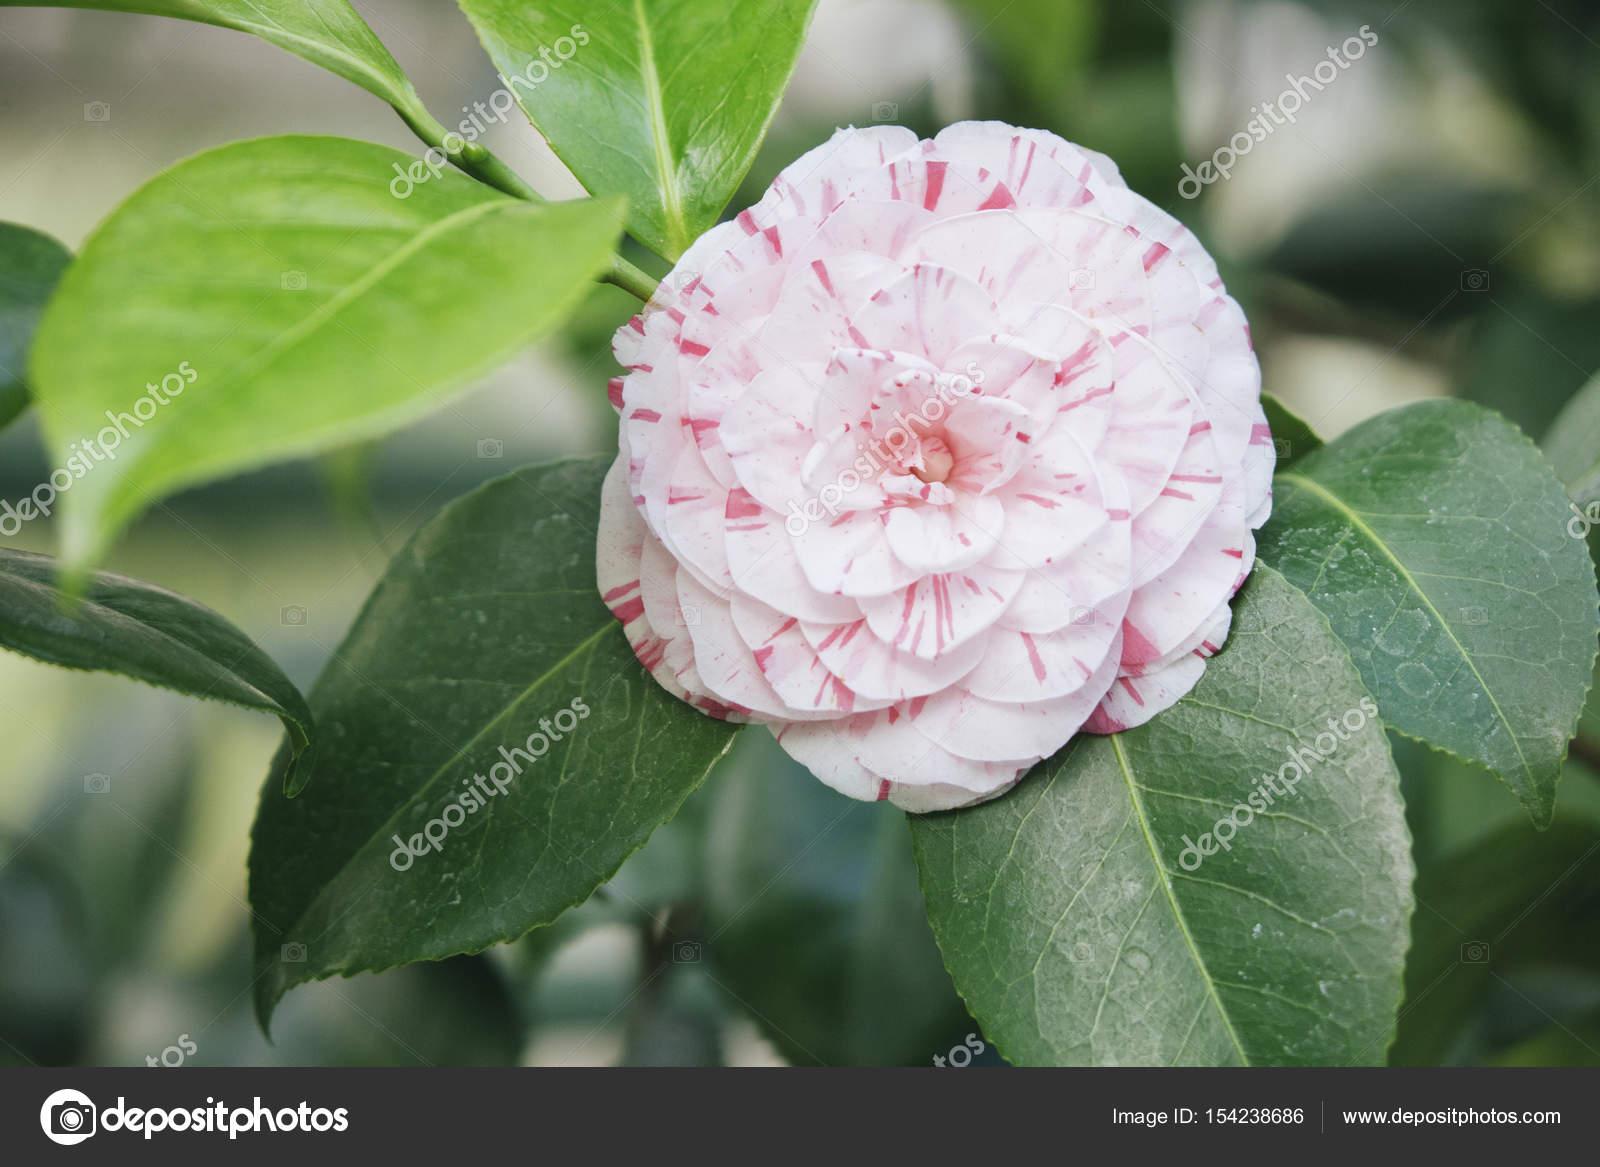 Japanese camellia camellia japonica pink flower stock photo japanese camellia camellia japonica pink flower stock photo mightylinksfo